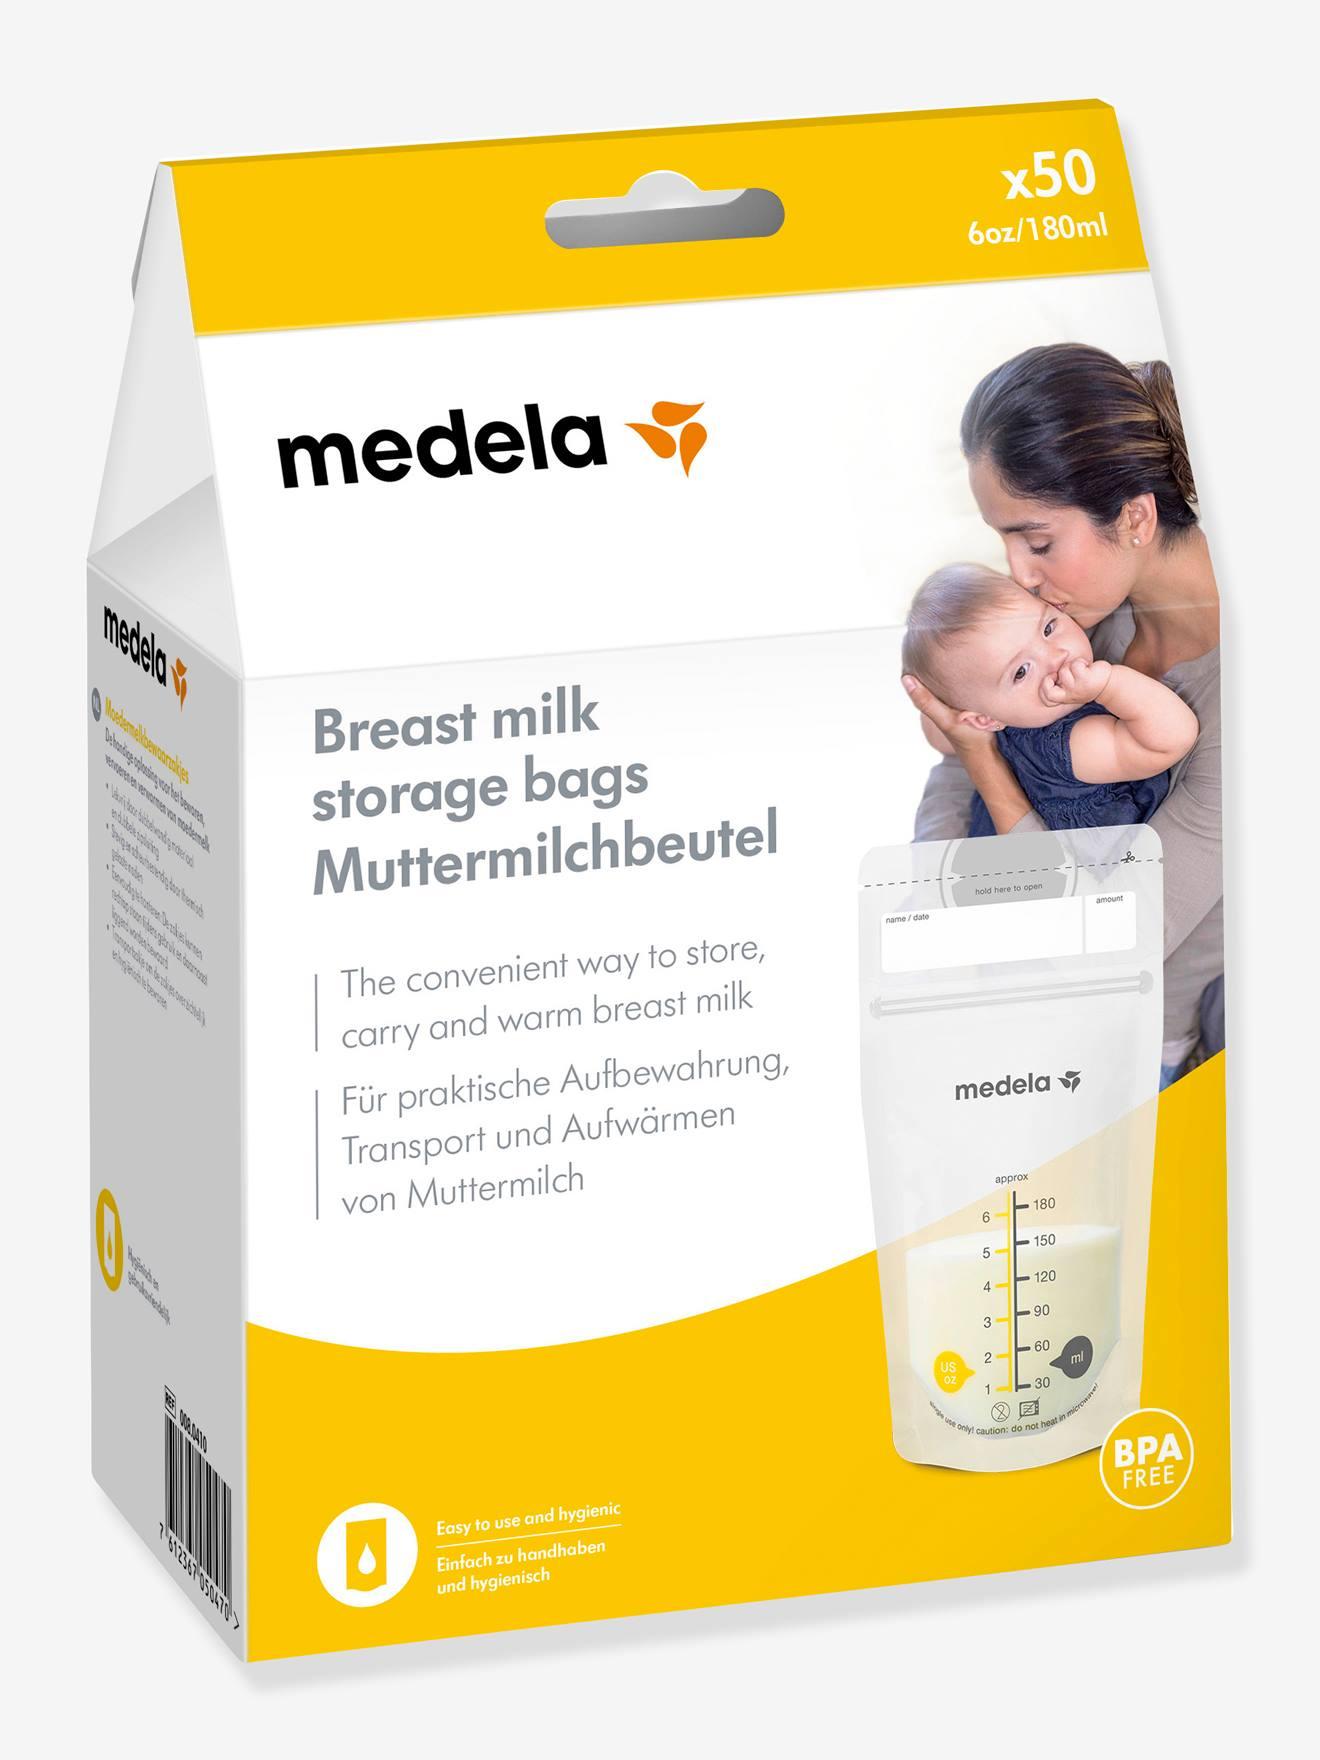 MEDELA Caja de 50 bolsitas de conservación de leche materna Pump & Save MEDELA no color